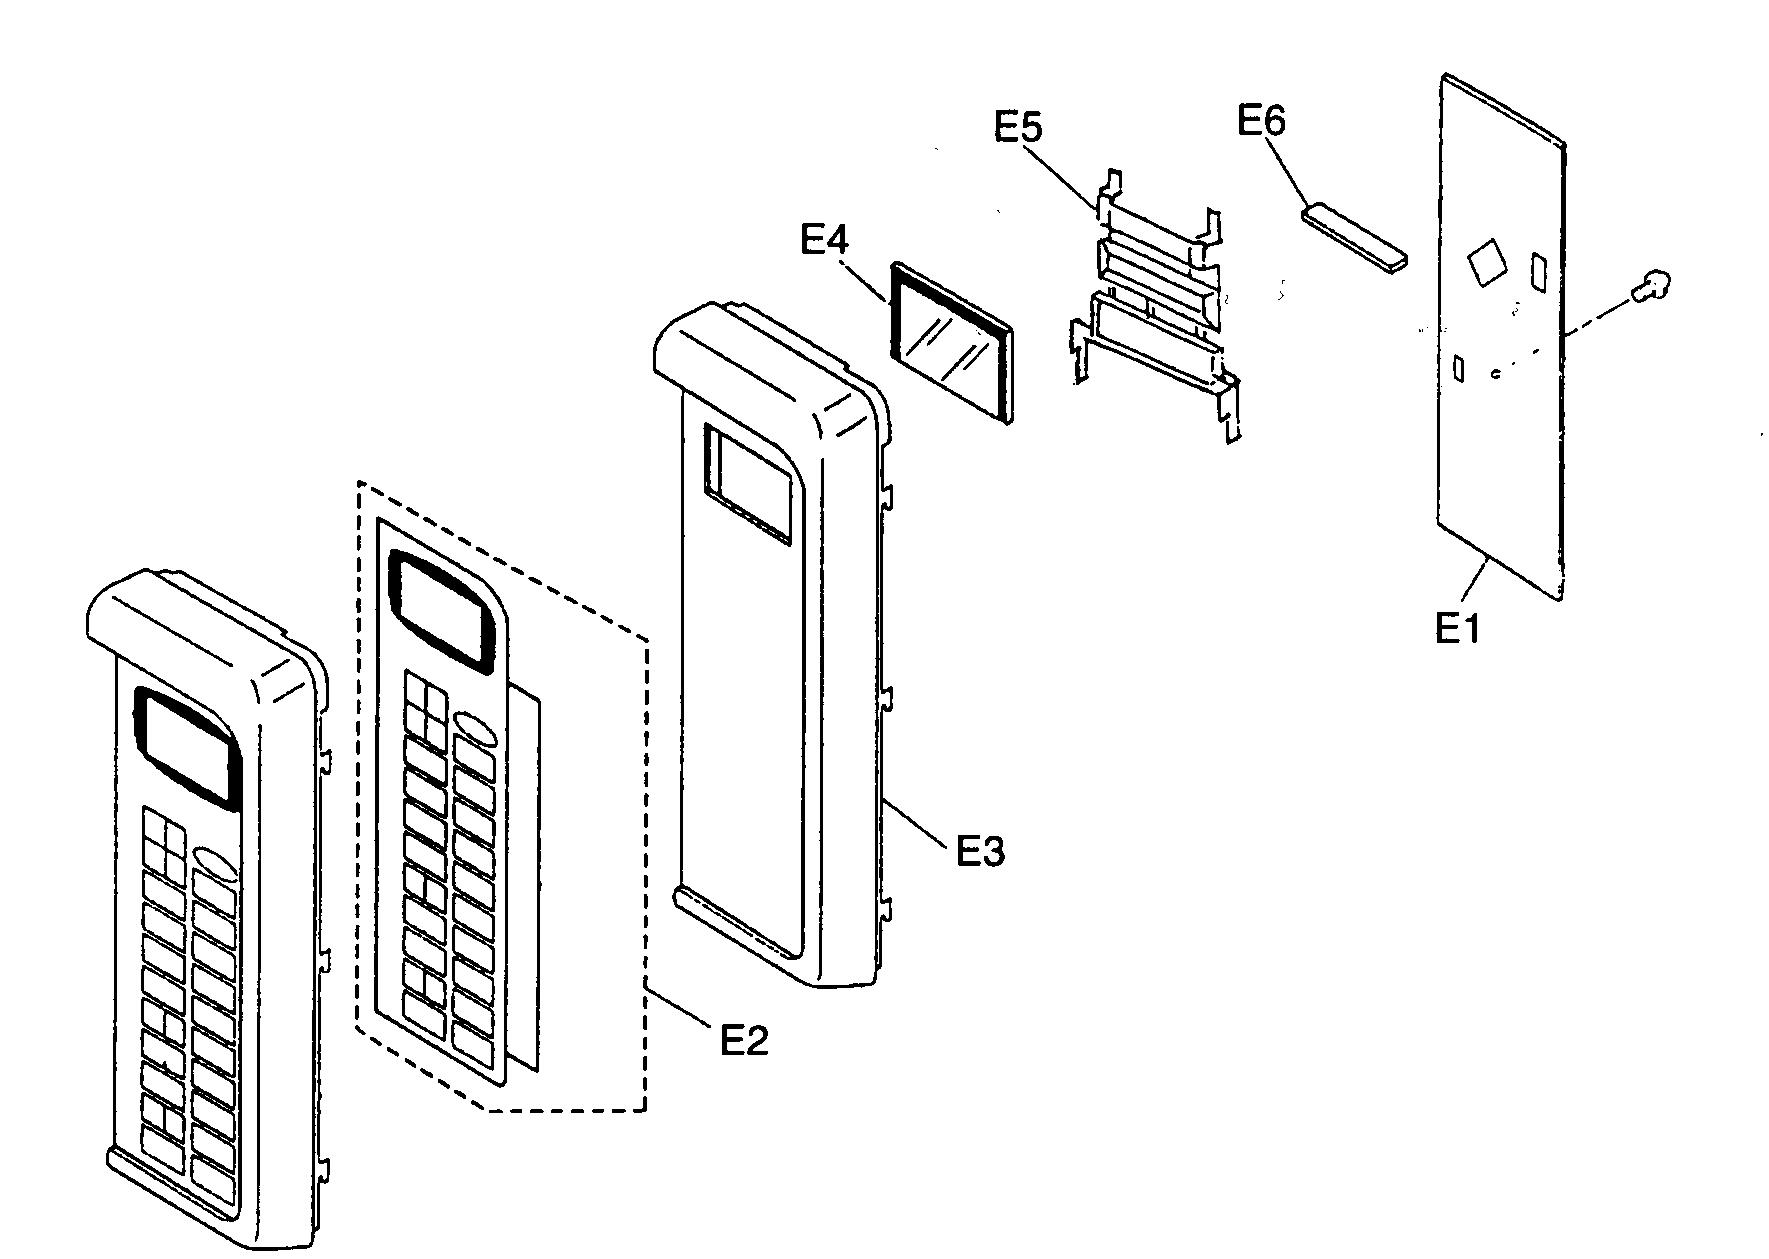 Panasonic model NN-S540BF countertop microwave genuine parts